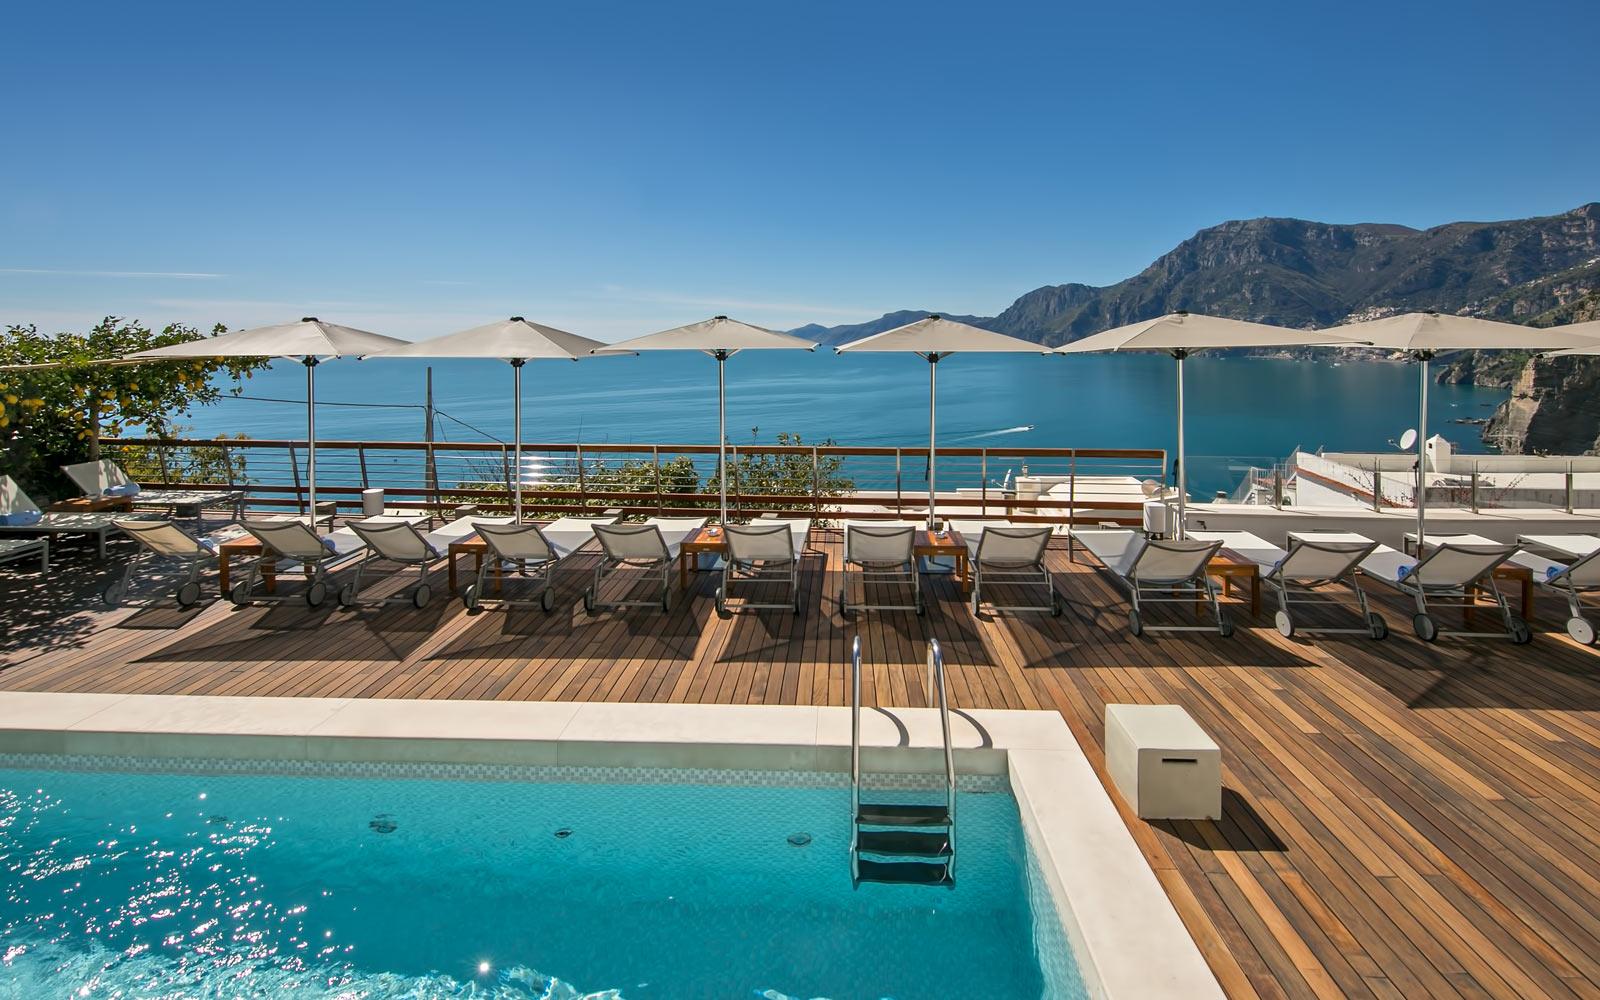 Poolside View at Casa Angelina